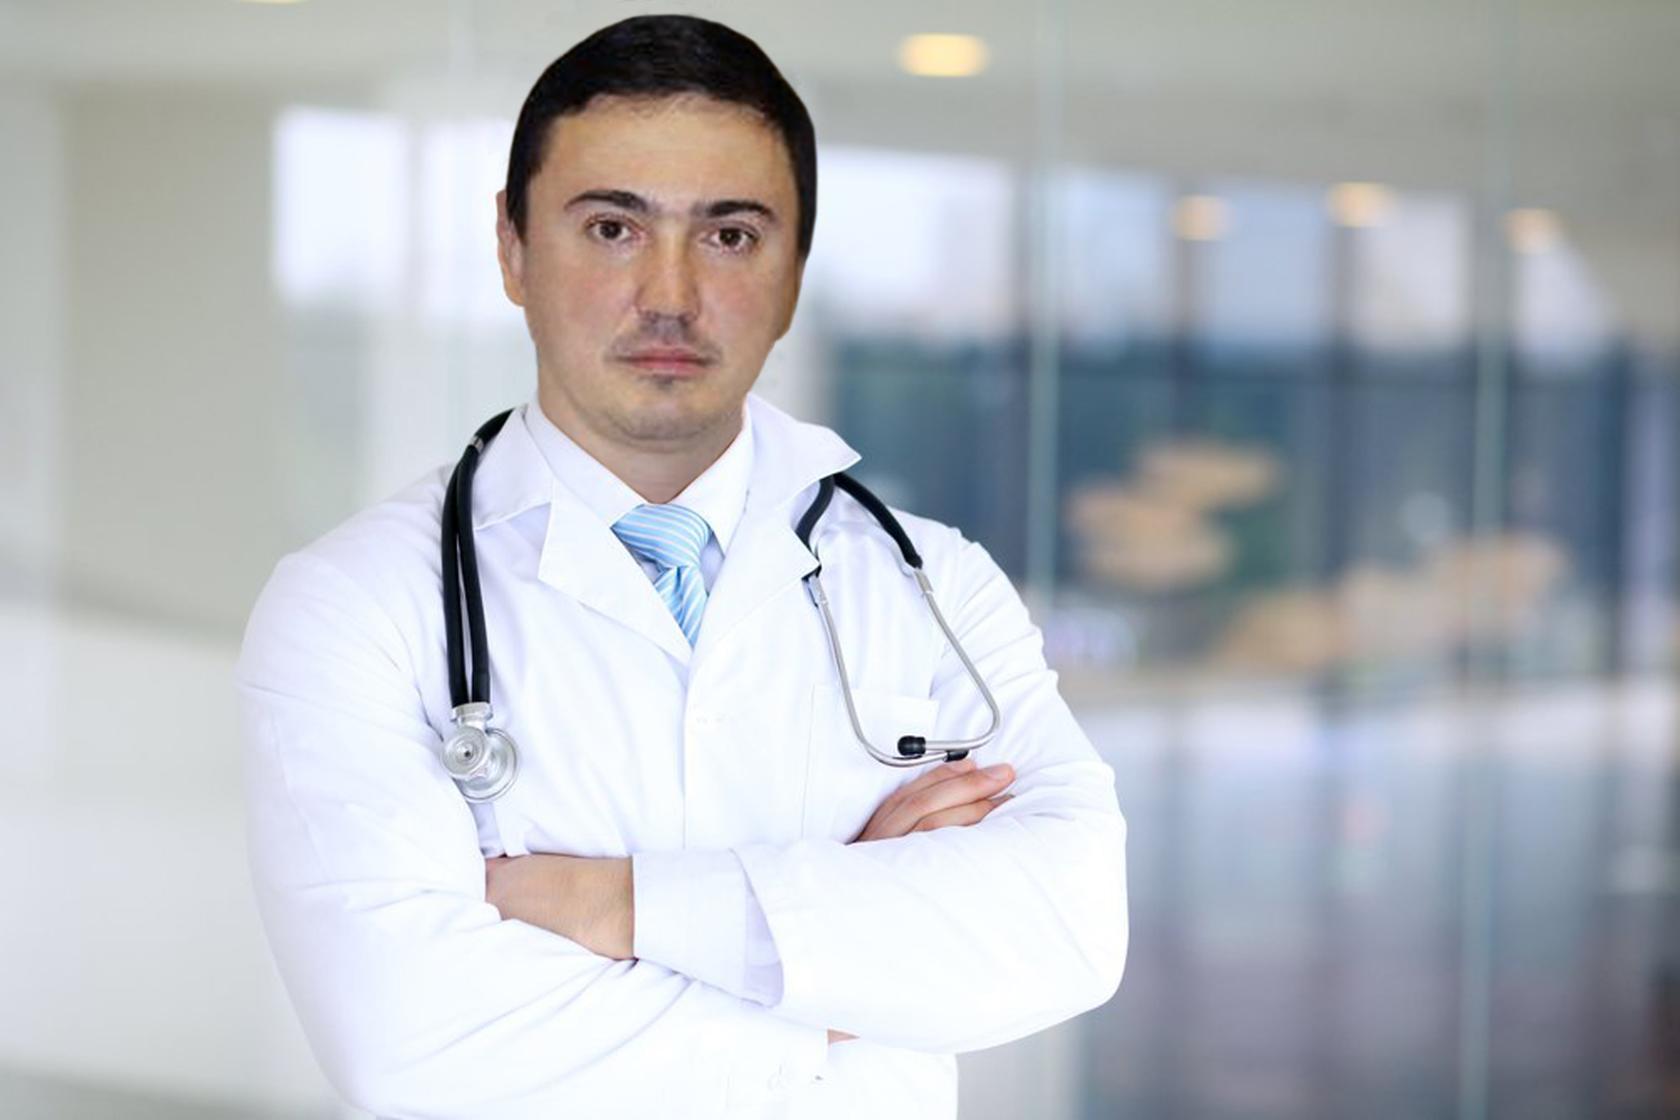 Нейрохирург - Литвиненко Д.В. Краснодар